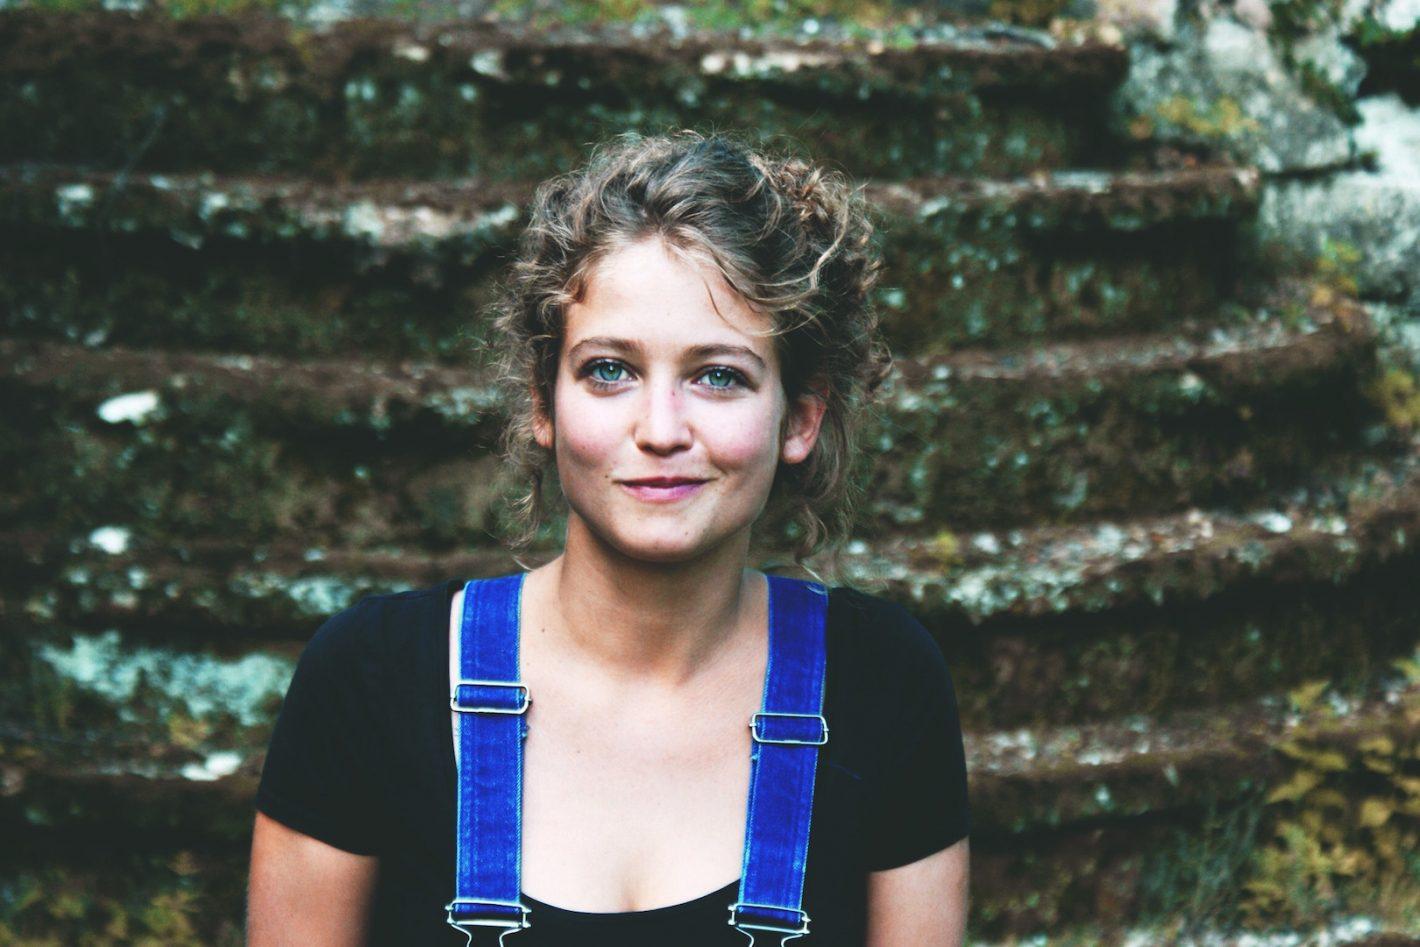 Nikon Film Festival Sophie de Furst